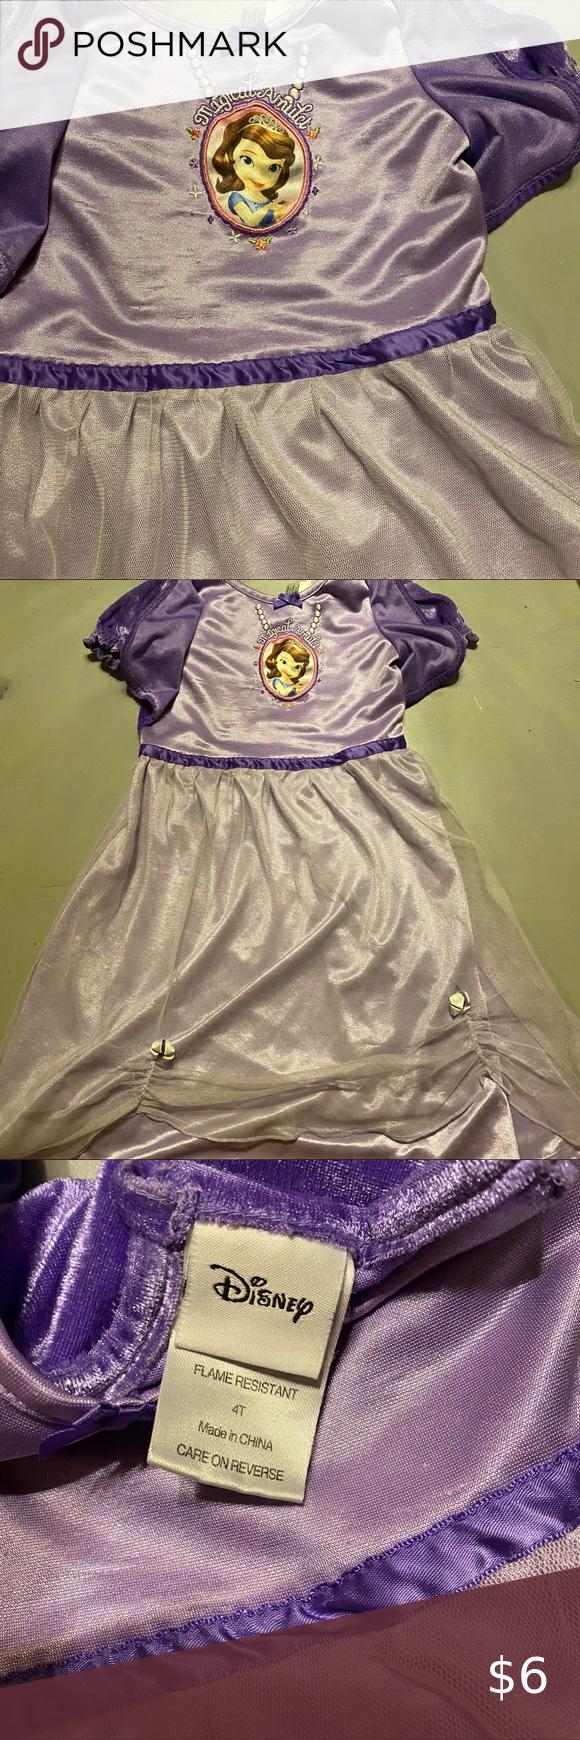 Purple Disney Sophia Dress Dress Up Disney Princess Sophia Size 4t Purple Dress Dress Up Disney Dresses Casual Sophia Dress Disney Dresses Clothes Design [ 1740 x 580 Pixel ]